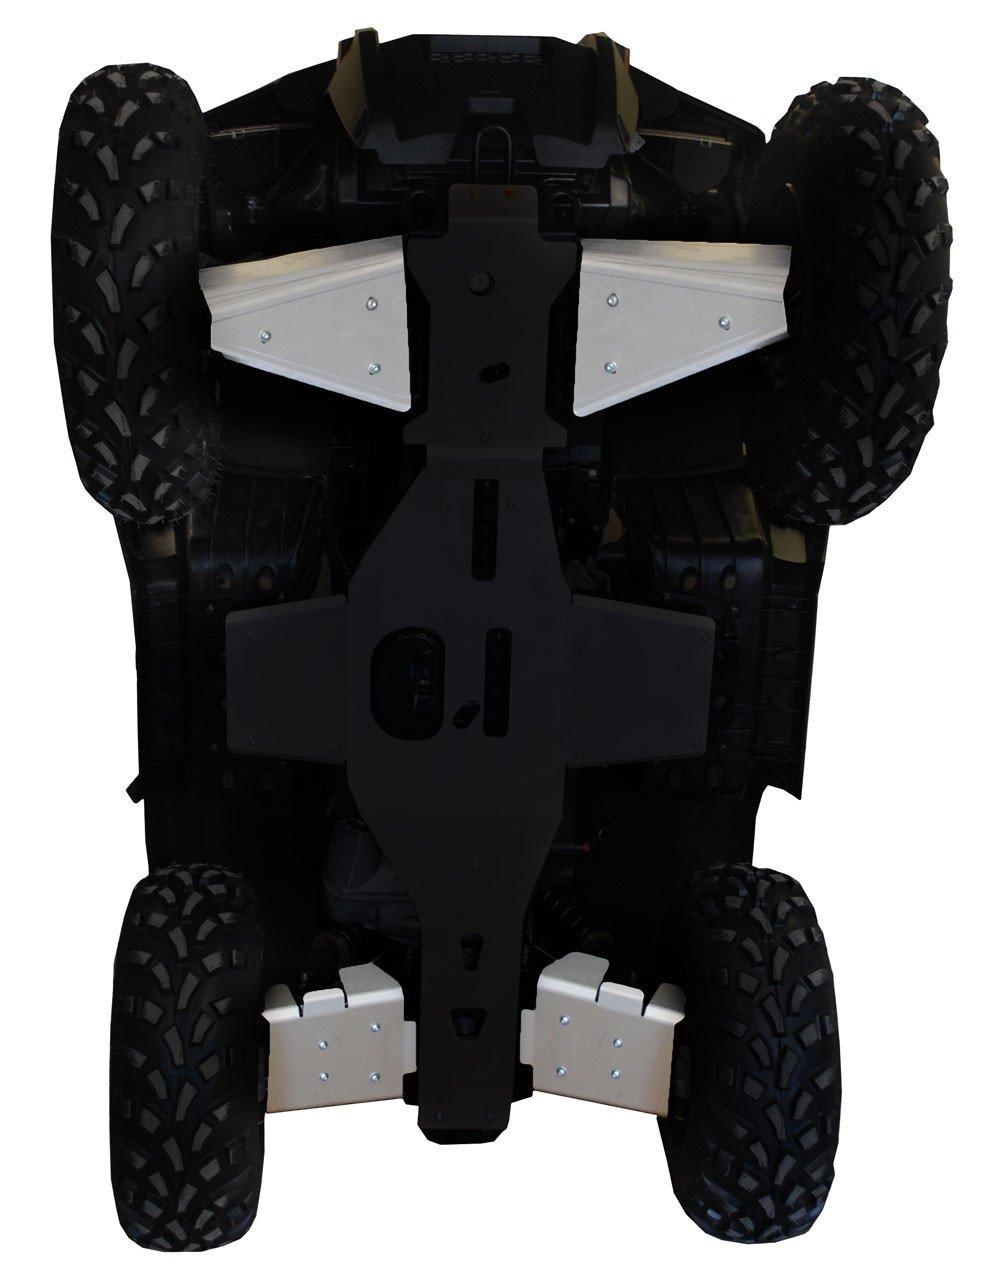 RICOCHET FRONT AND REAR A-ARM GUARDS 4 PIECES POLARIS SPORTSMAN 570 - ALUMINUM-0